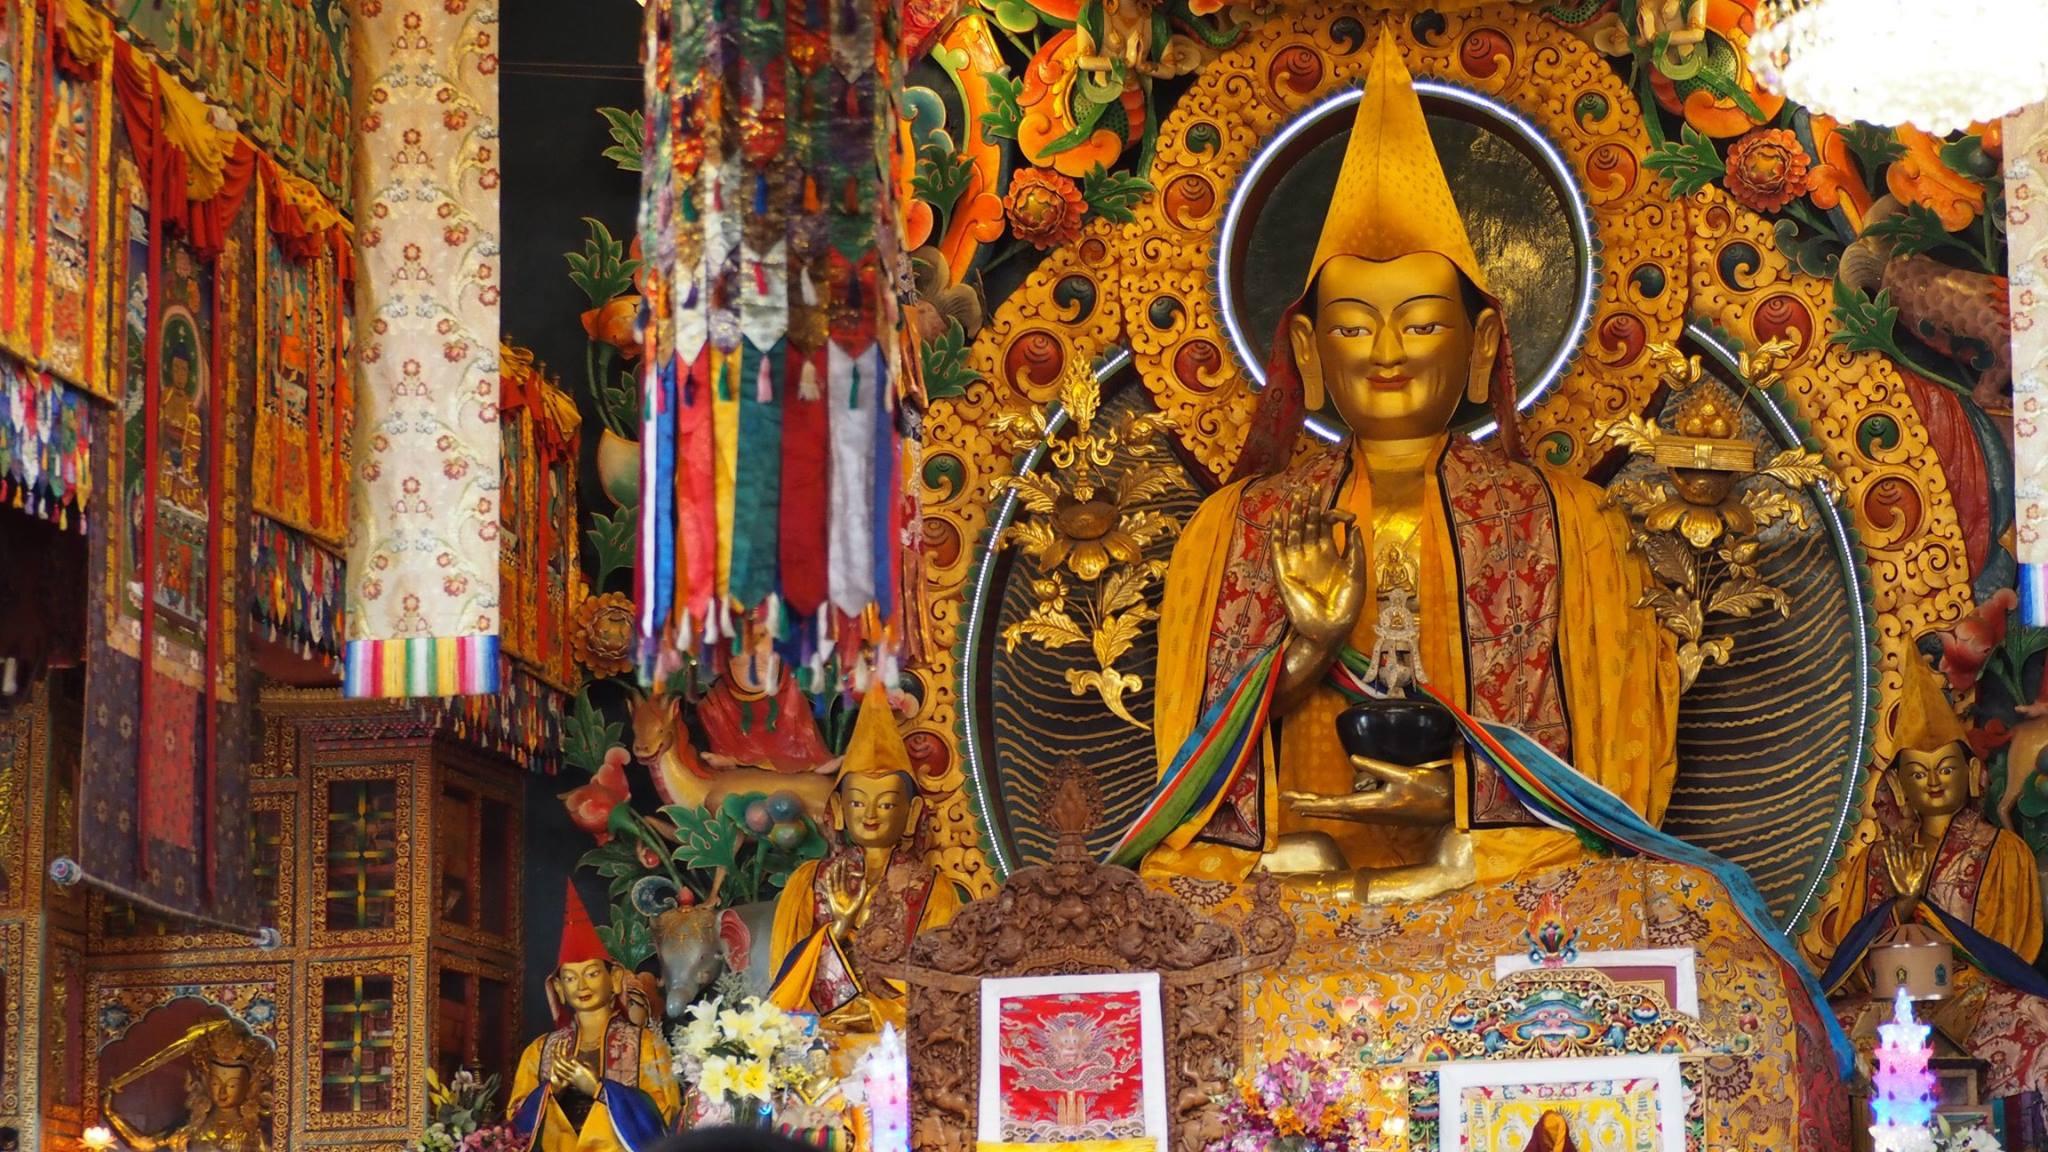 Lama Tsongkhapa as the main statue in Kopan gompah, Nepal. (Photo Ven Tenzin Tsultrim)